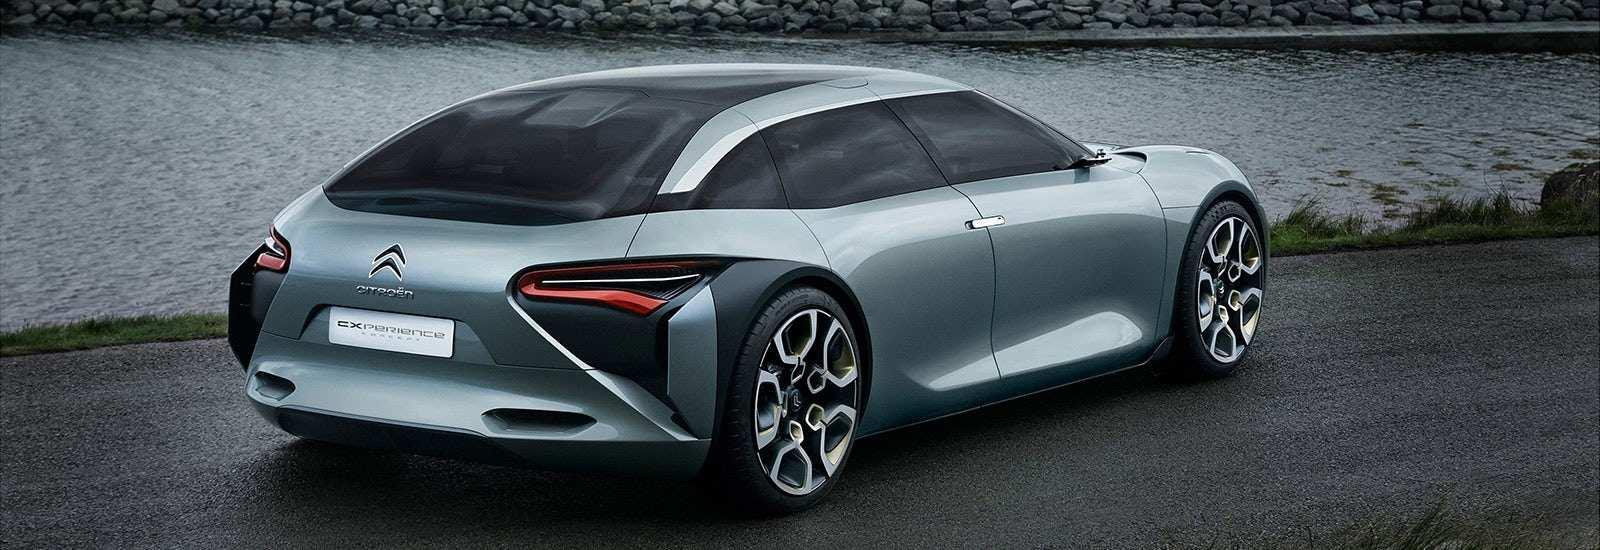 15 Concept of Citroen C6 2019 Performance by Citroen C6 2019